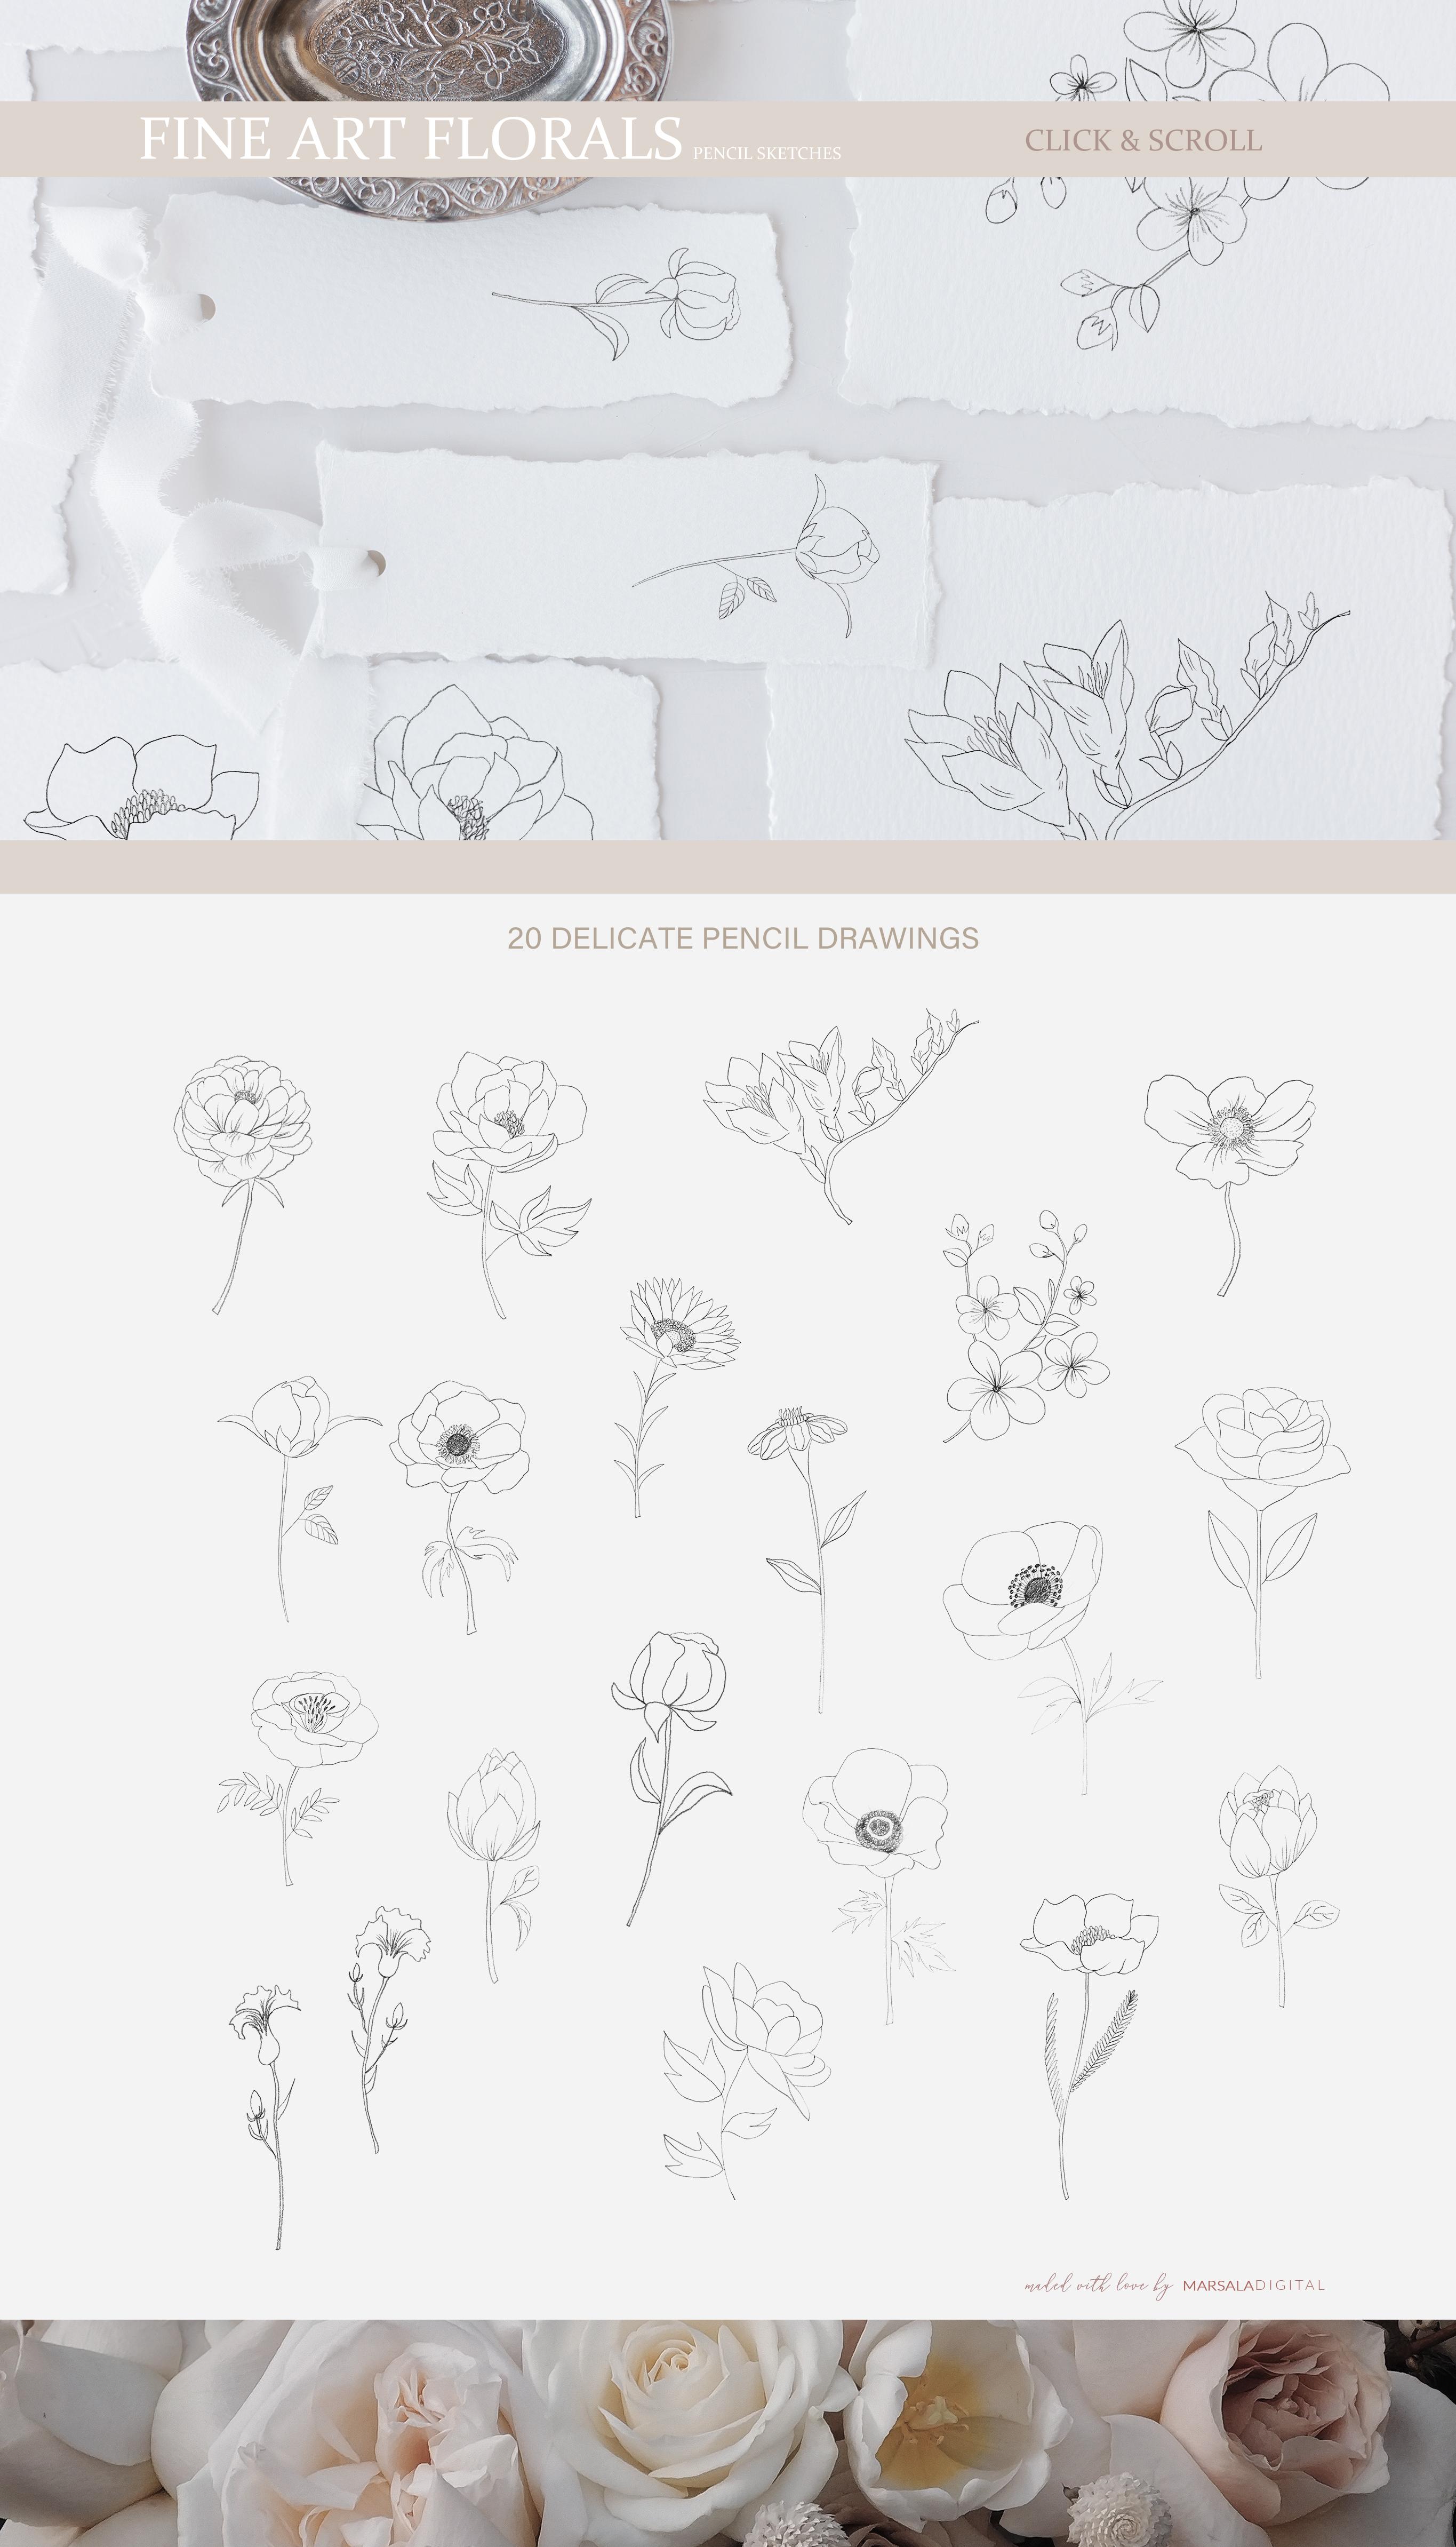 Fine Art Florals - Pencil Sketches example image 4